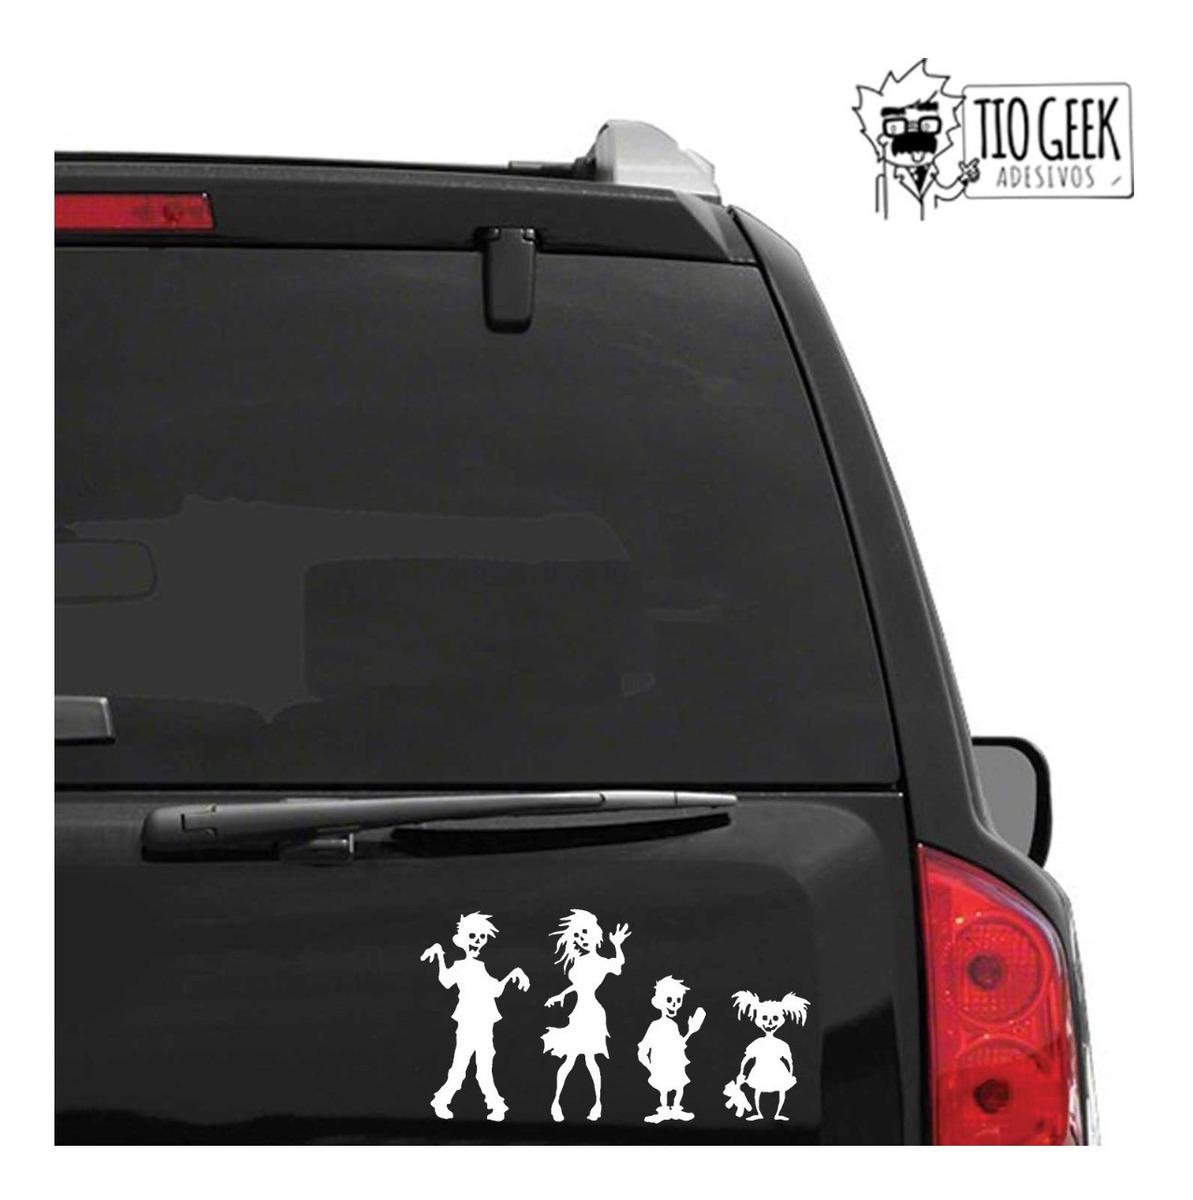 faa3032cfe Kit 5 Adesivos Família Feliz Zumbi - Carro Walking Dead - R$ 23,00 ...